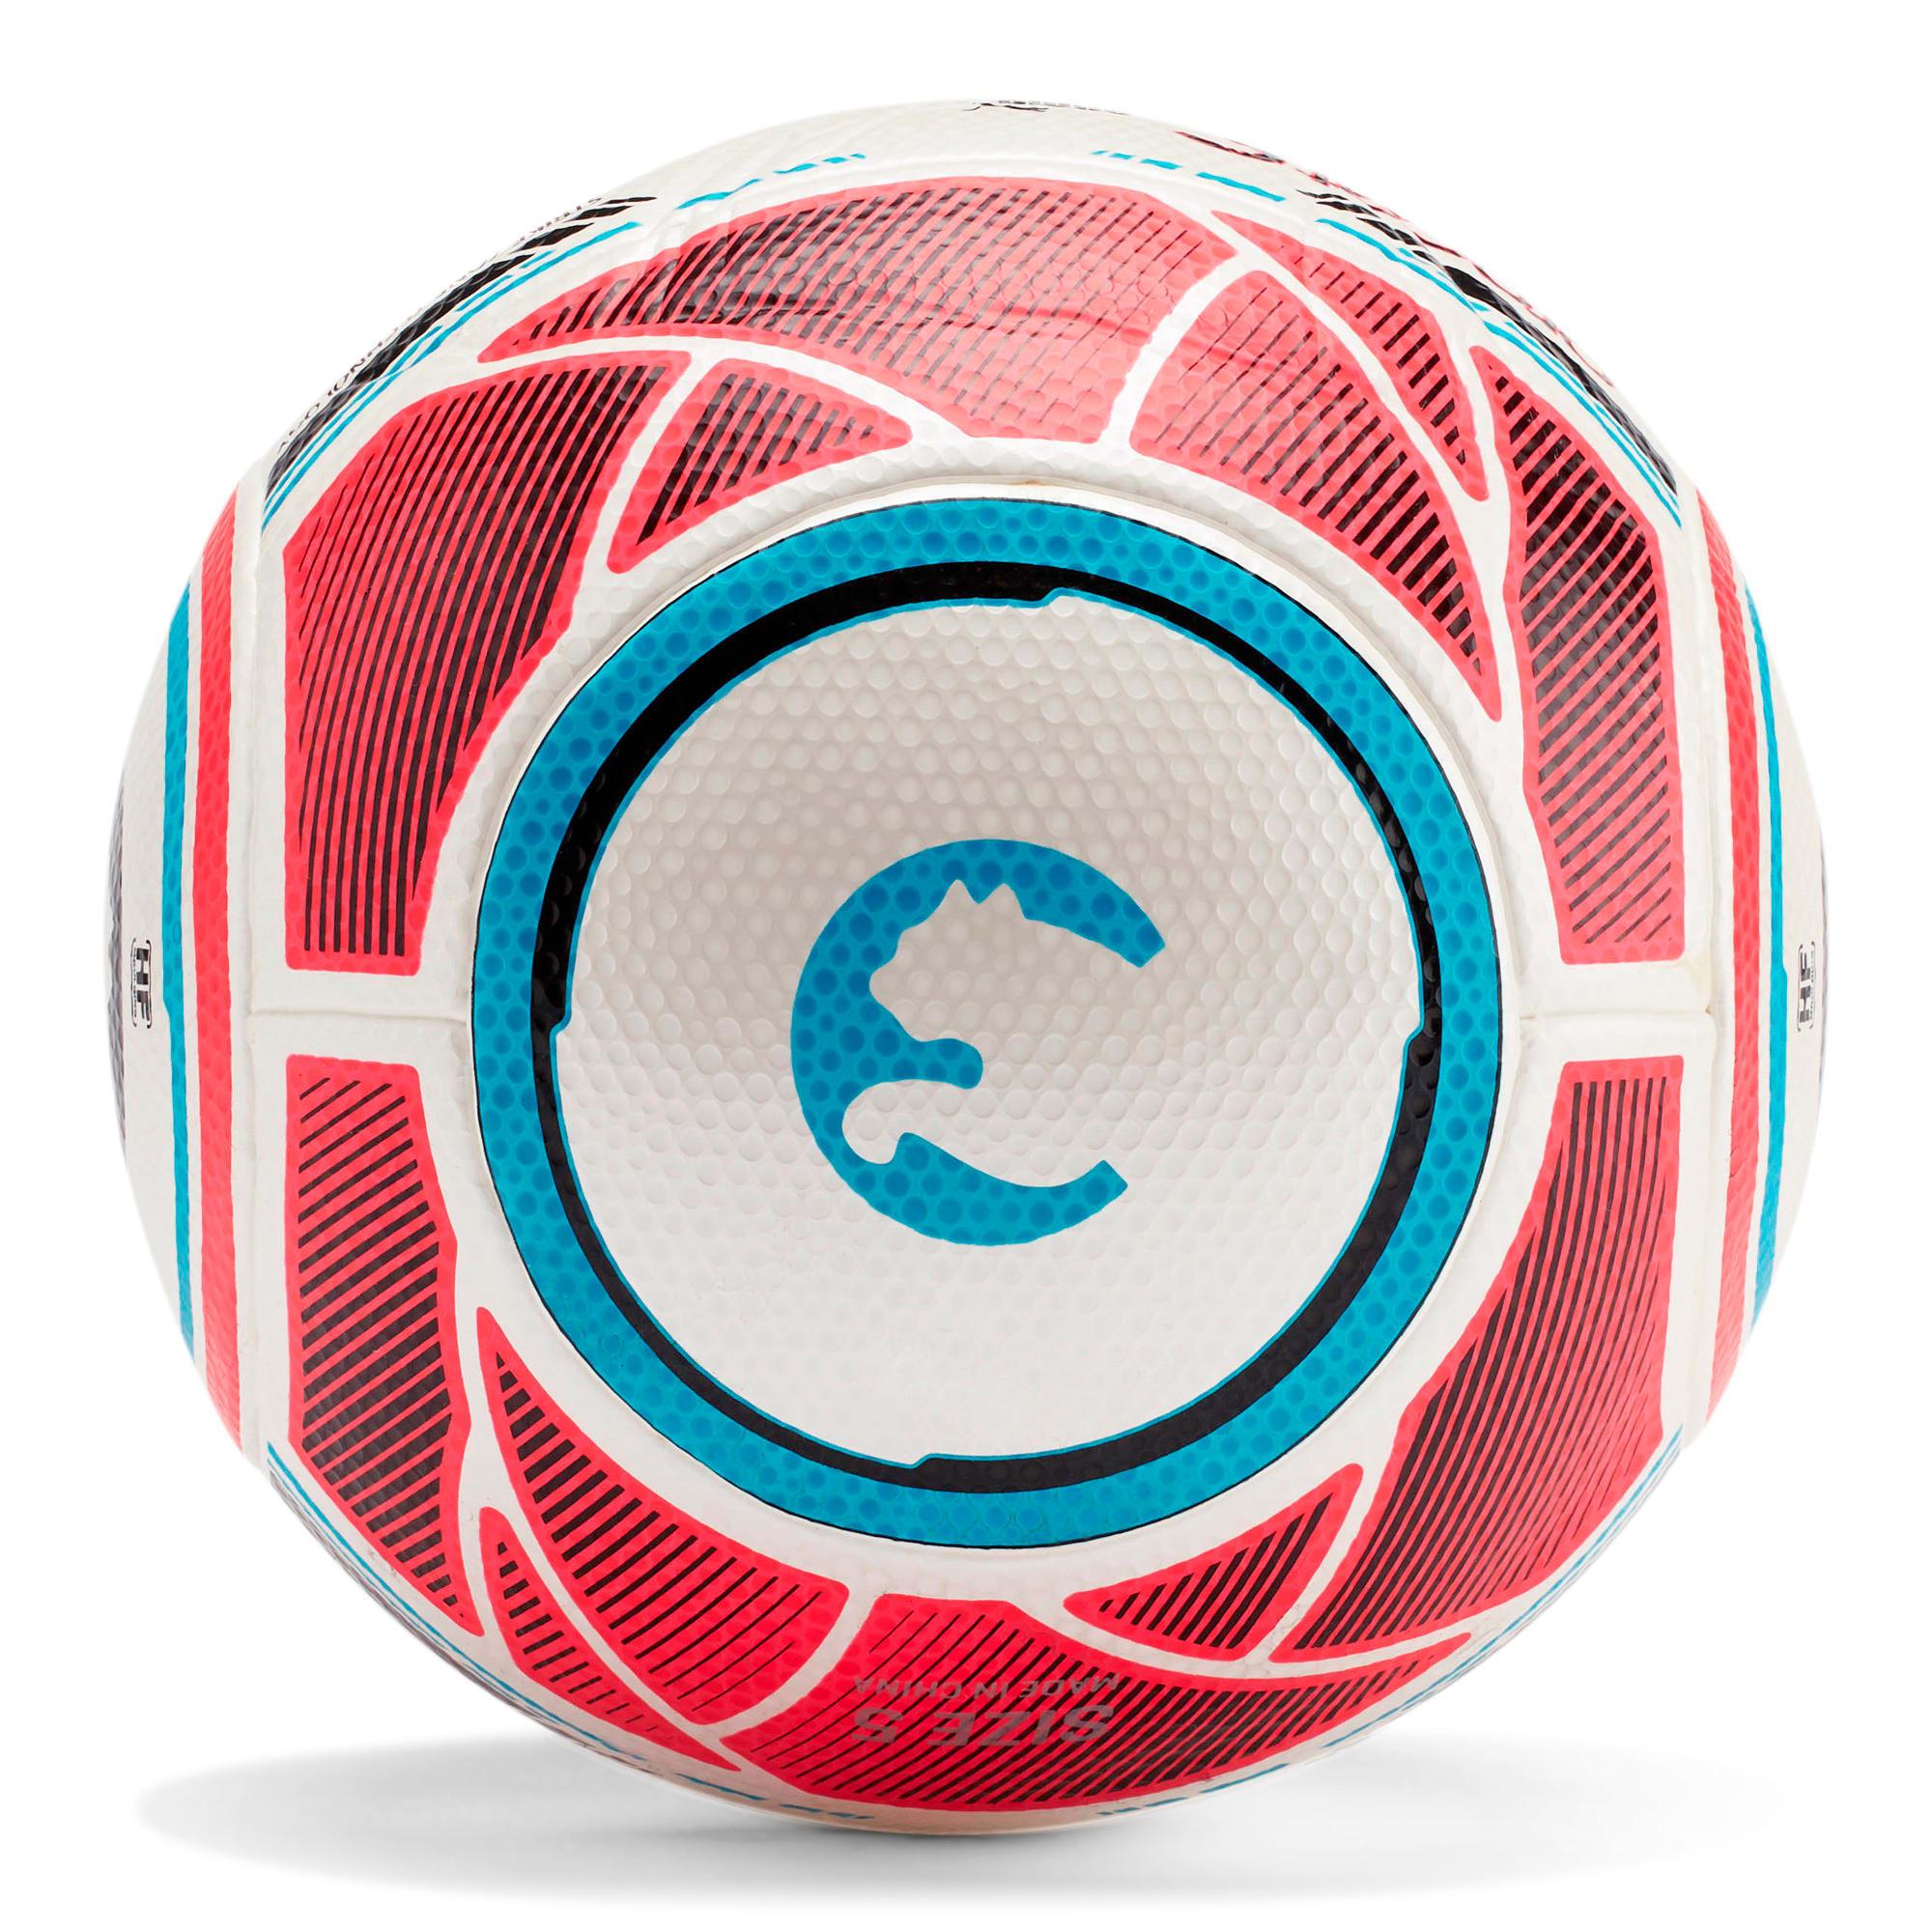 Thumbnail 2 of ProCat ProComp Soccer Ball, CORAL, medium